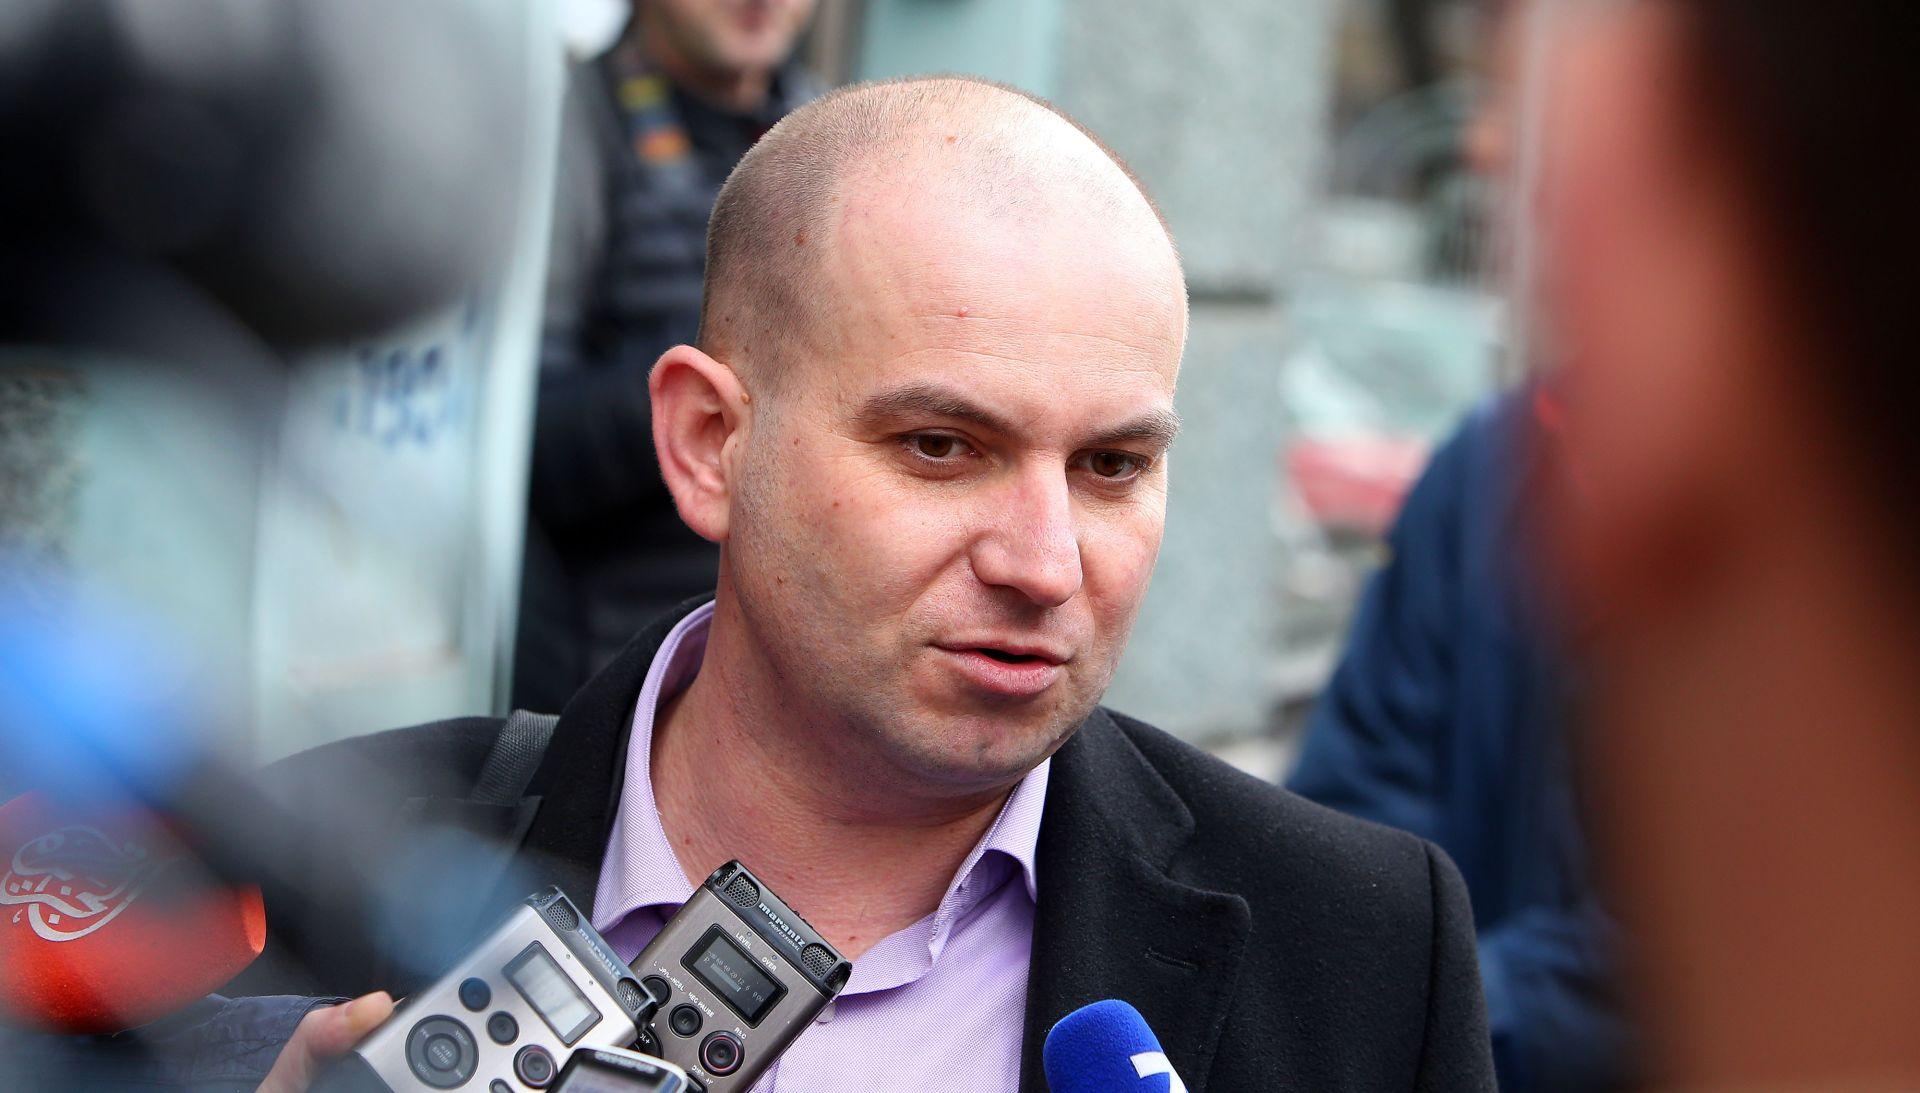 MIROSLAV ŠIMIĆ 'HDZ je stao u obranu kriminala u Agrokoru'